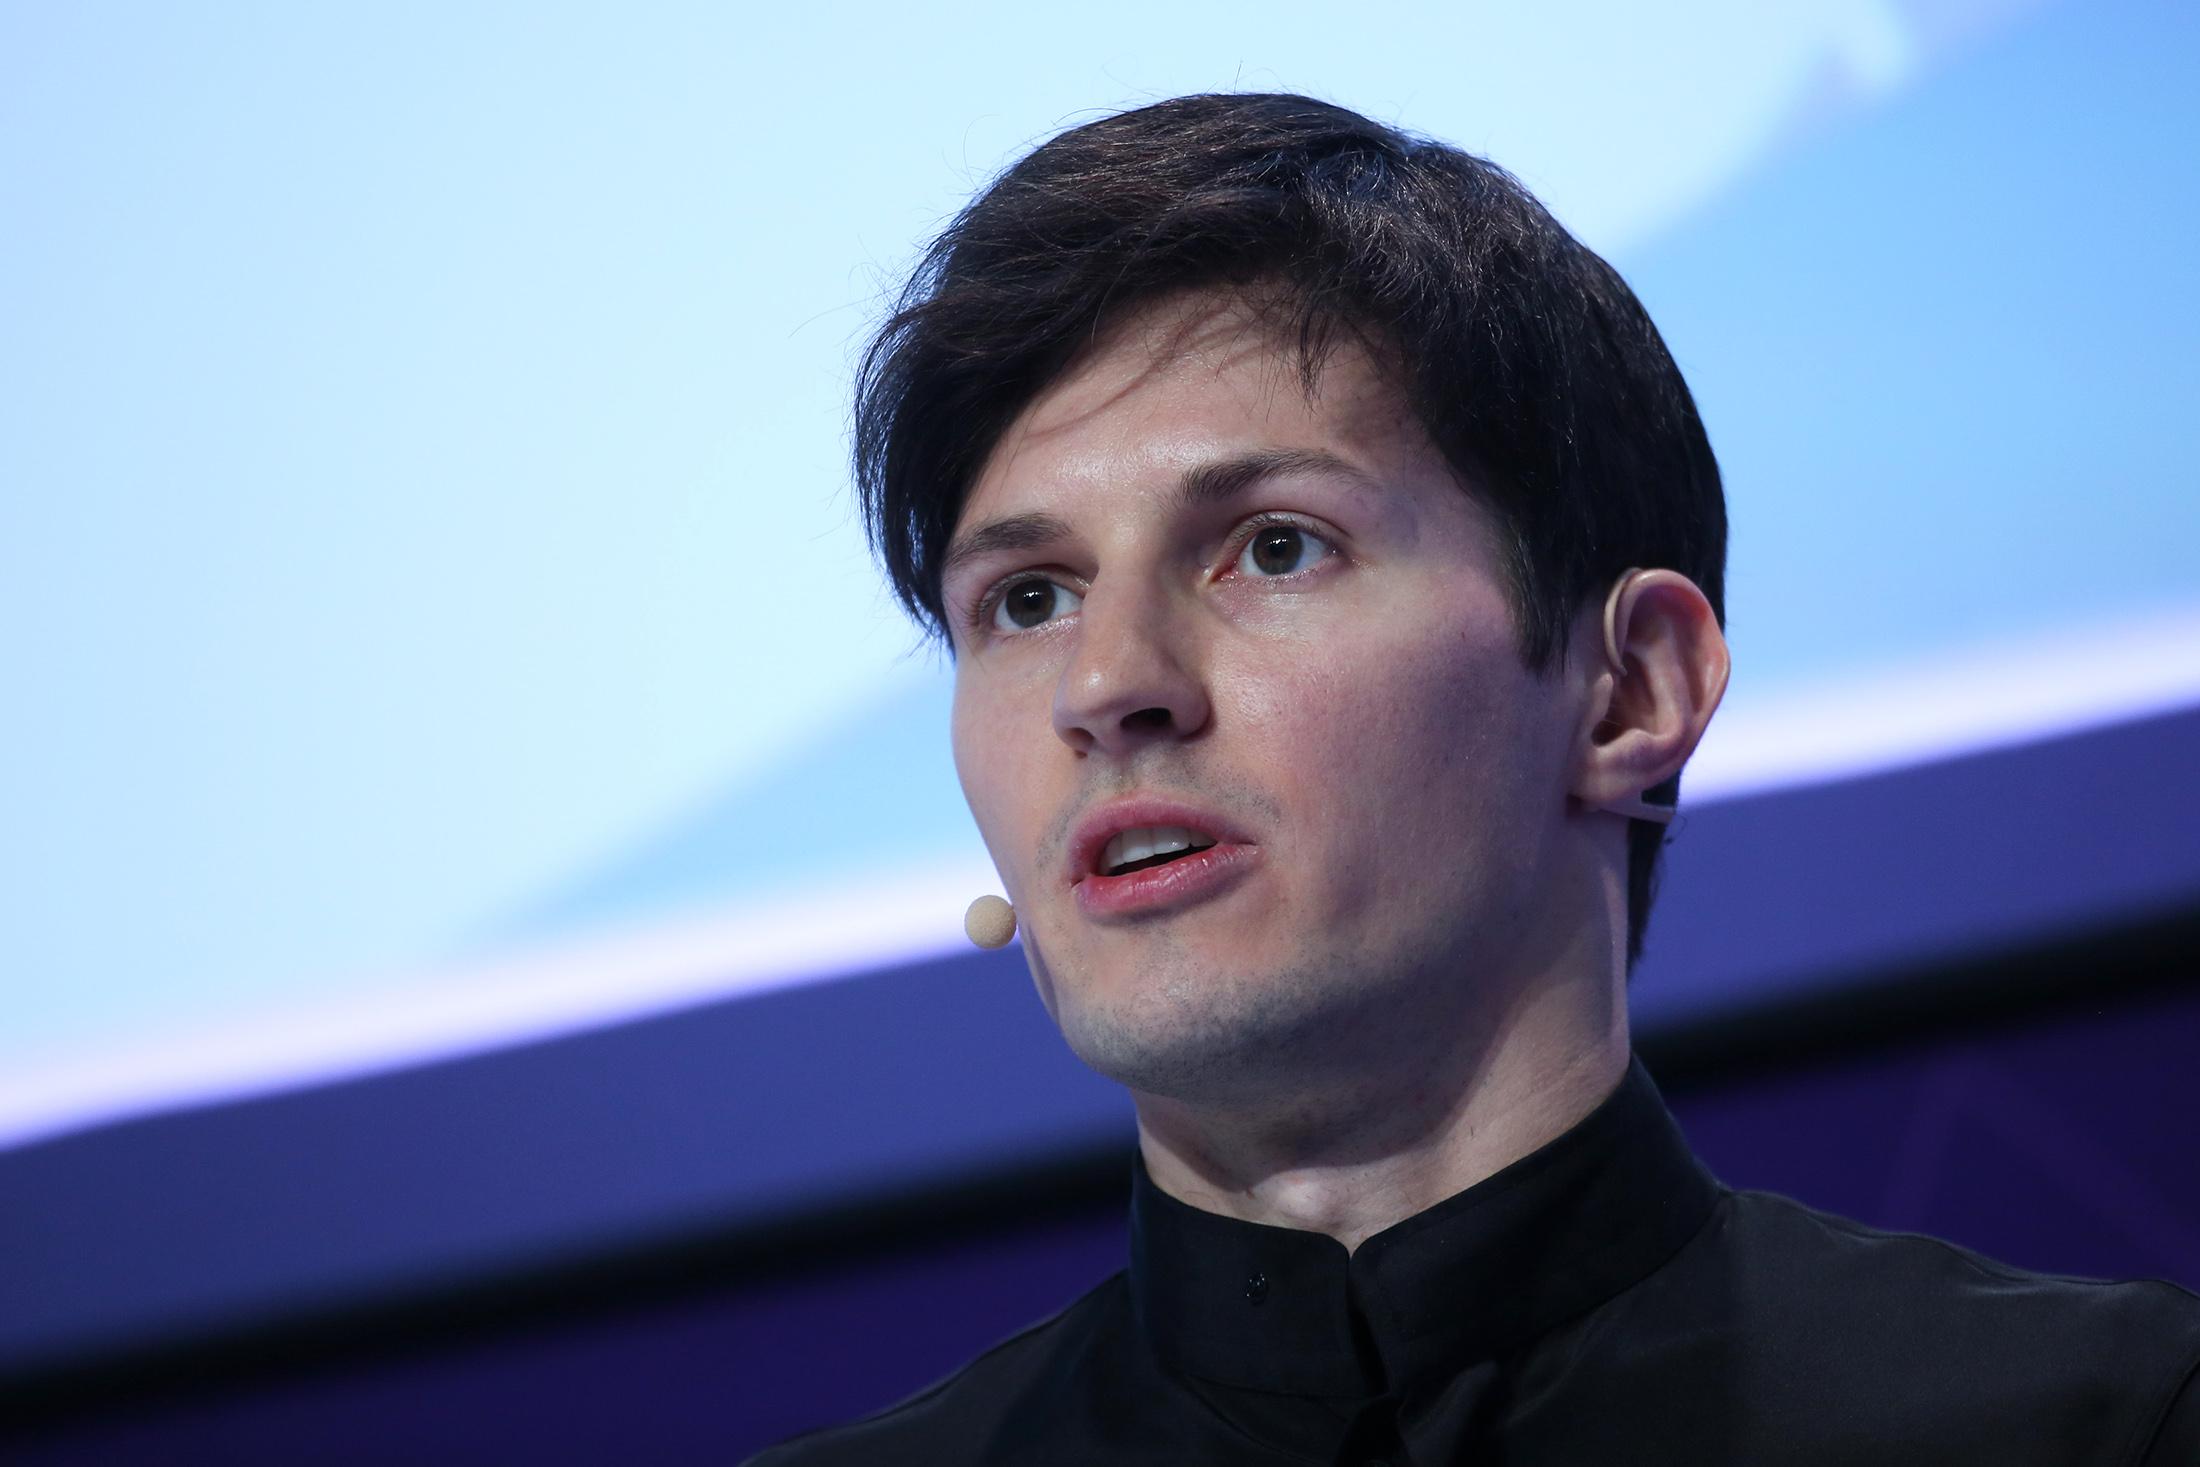 Pavel Durov commented on the vulnerability Telegram